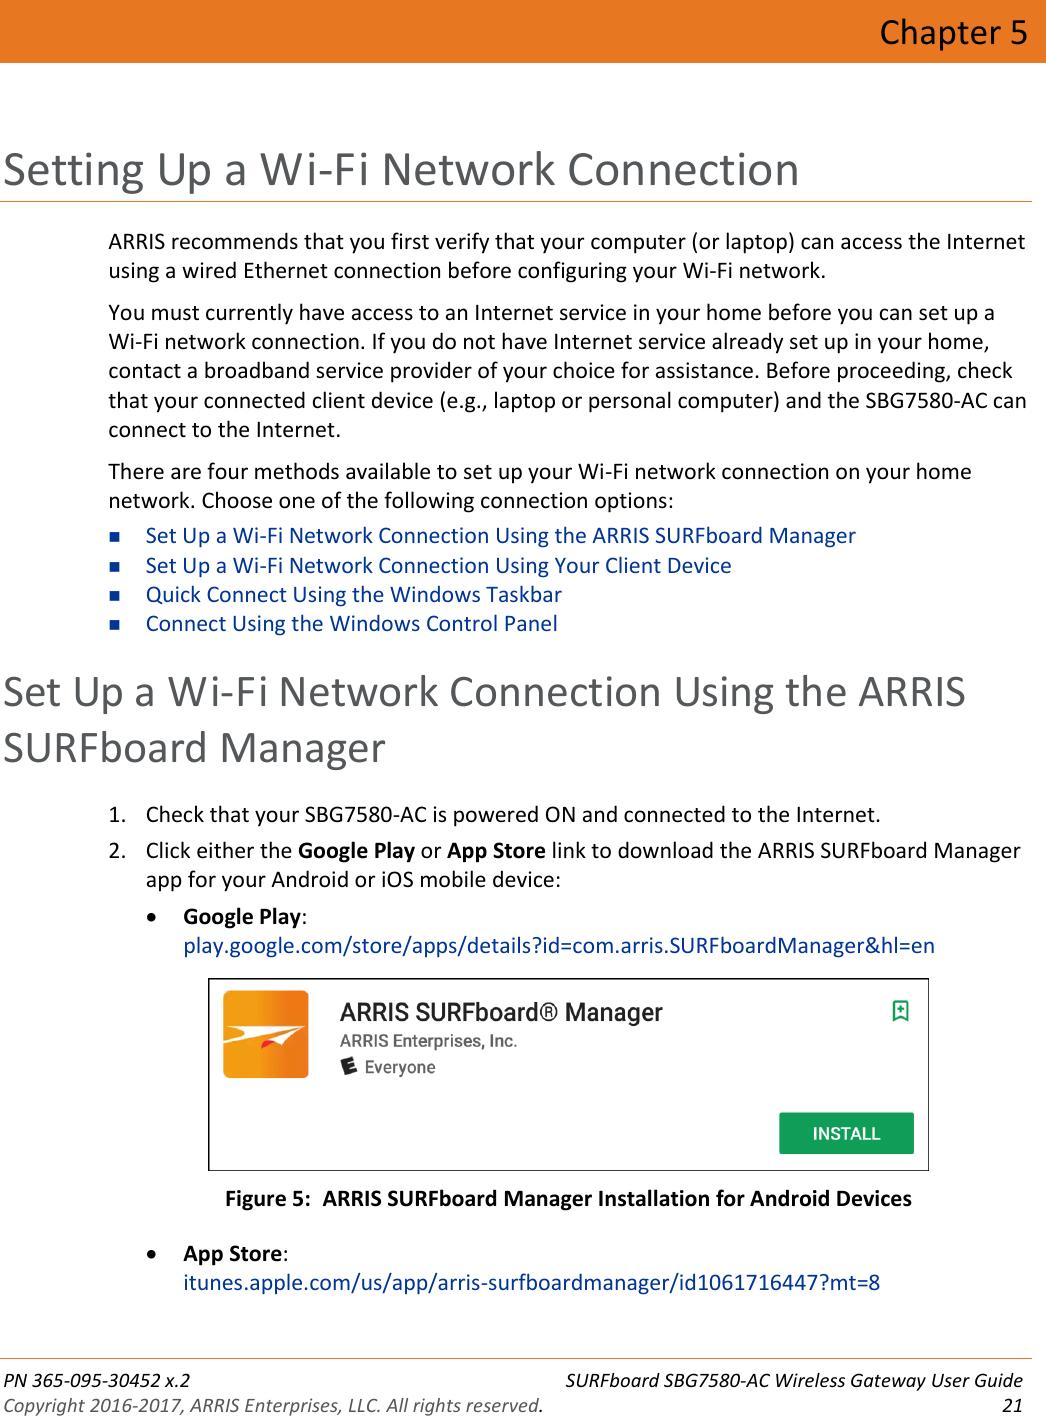 Arris SBG7580 AC McAfee User Guide Manual With Mc Afee App: SBG7580AC